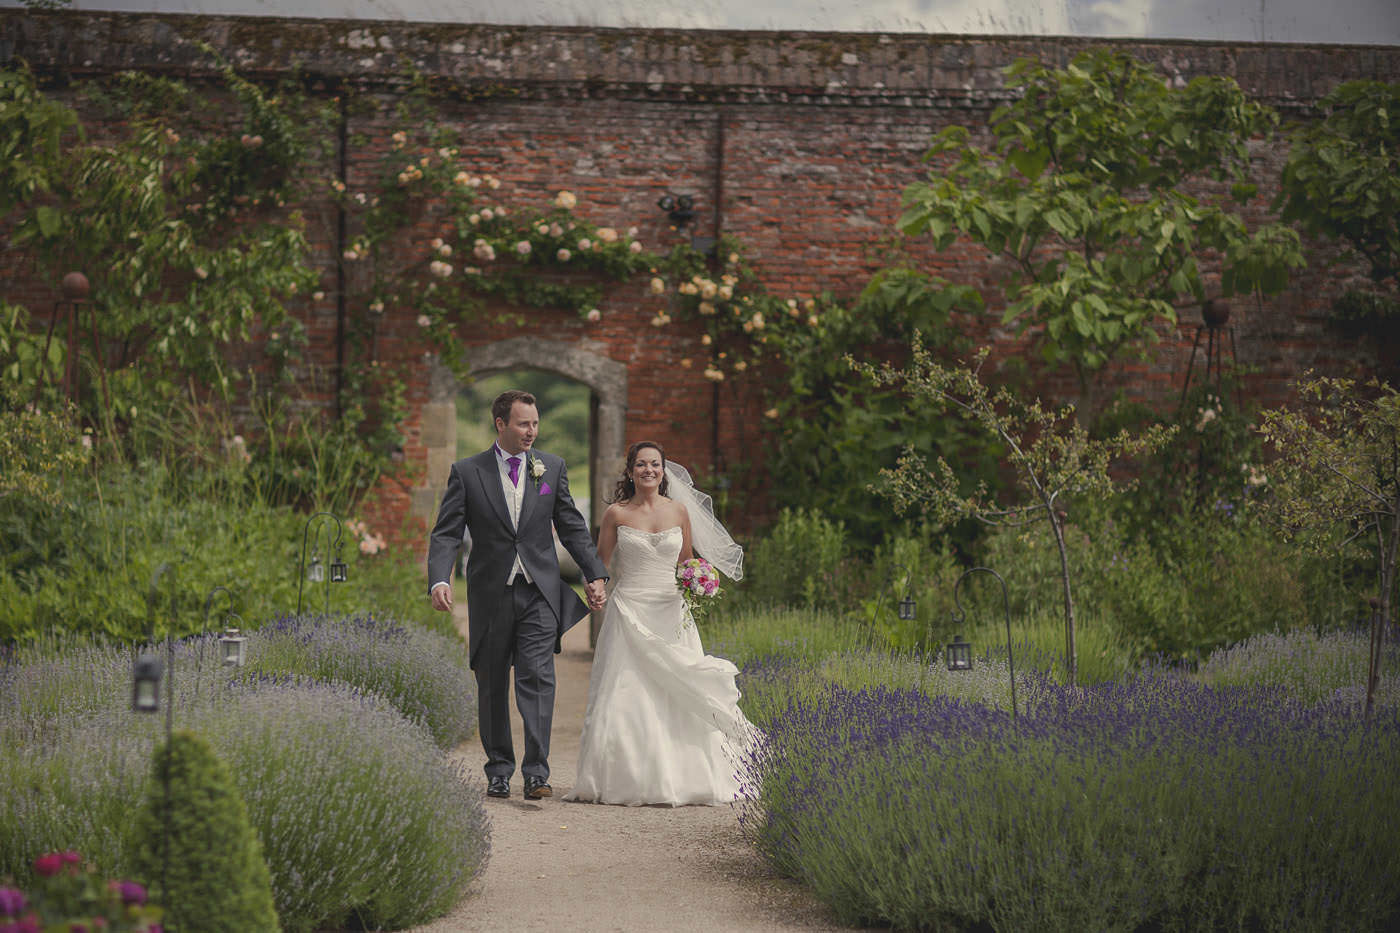 chrissarah walled garden midhurst wedding photographer 0084